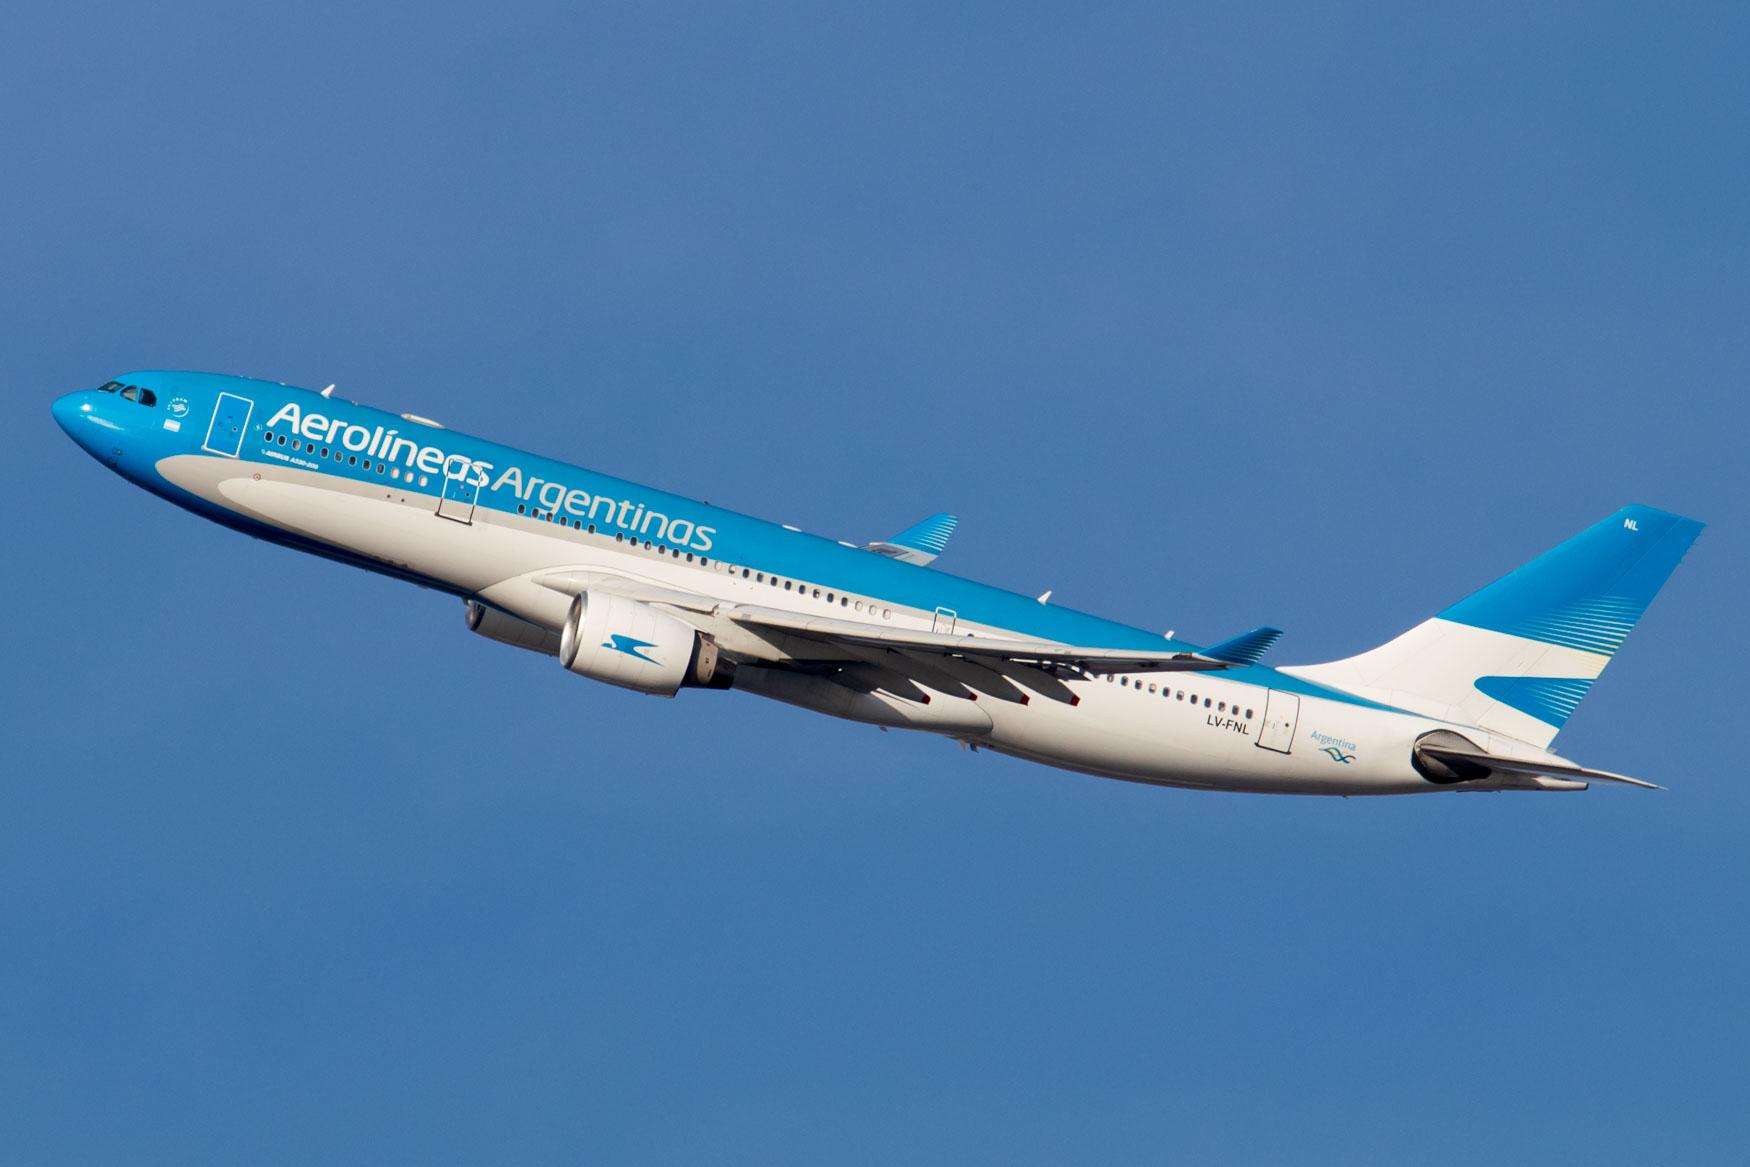 Aerolineas Argentinas A330 Departing JFK